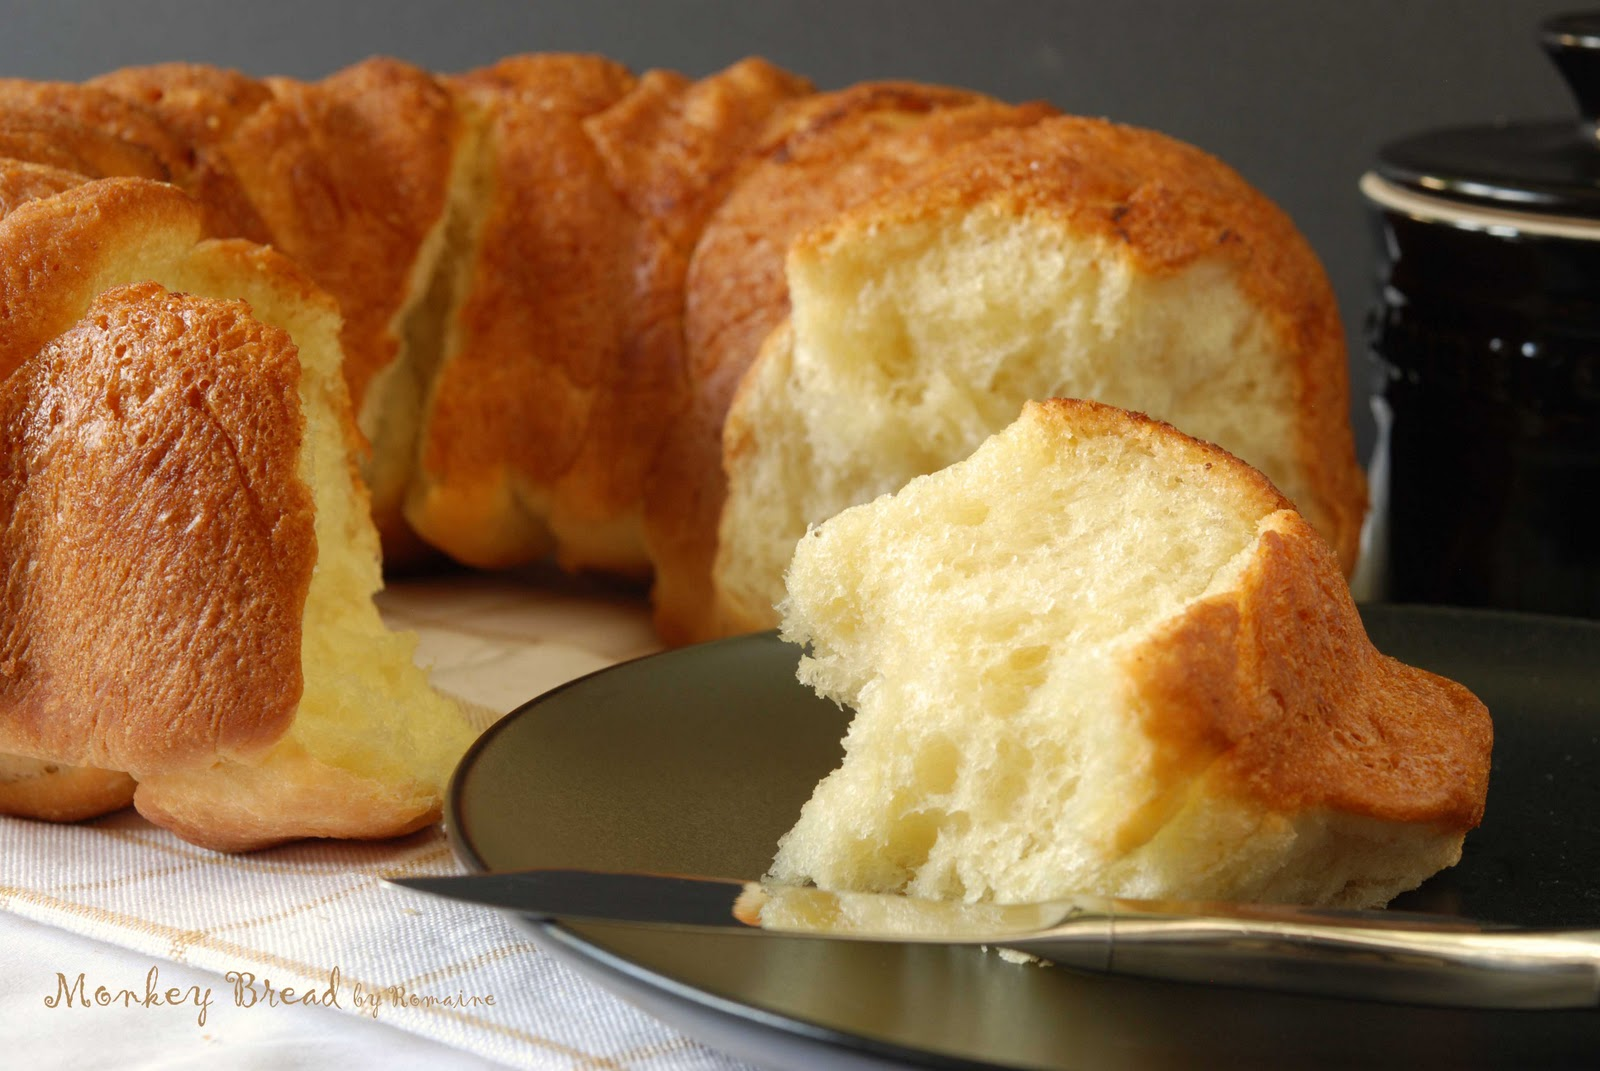 www.salad-in-a-jar.com/family-recipes/bread-machine-monkey-bread